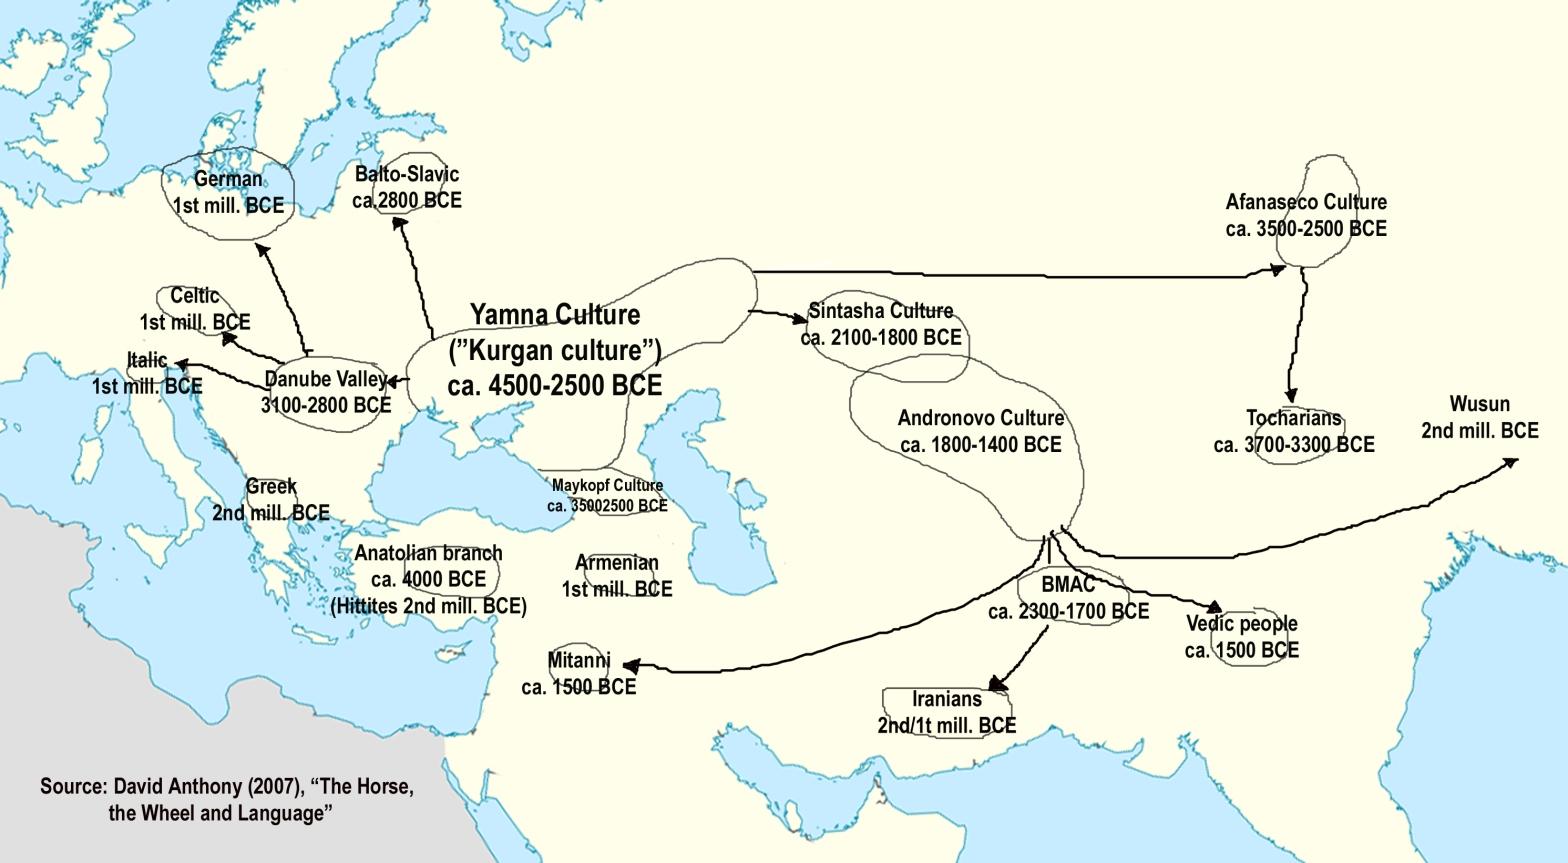 Indo-European Migrations according to Anthony